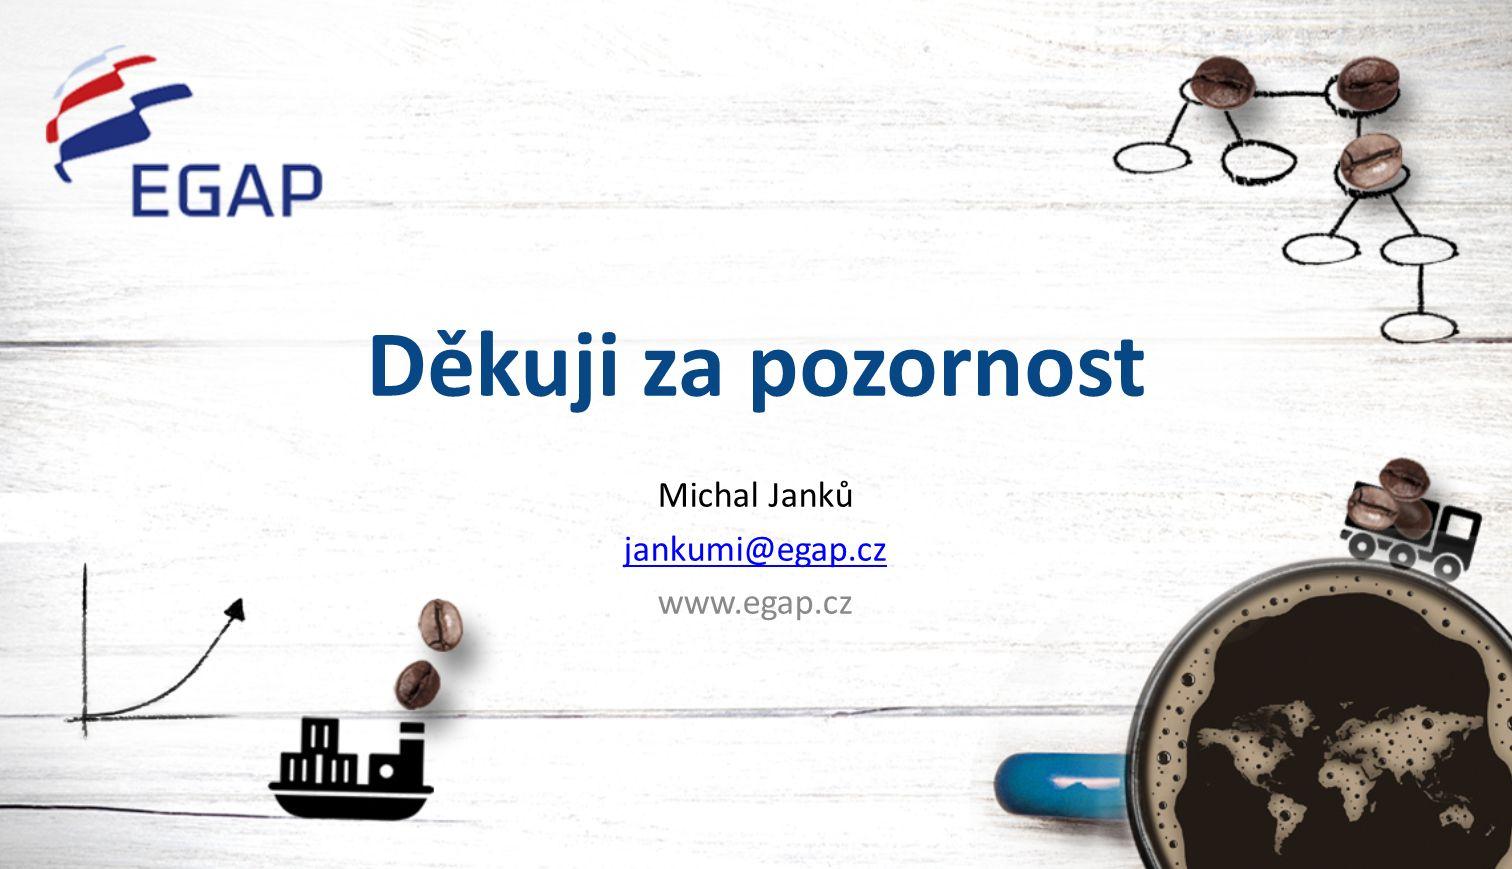 Děkuji za pozornost Michal Janků jankumi@egap.cz www.egap.cz